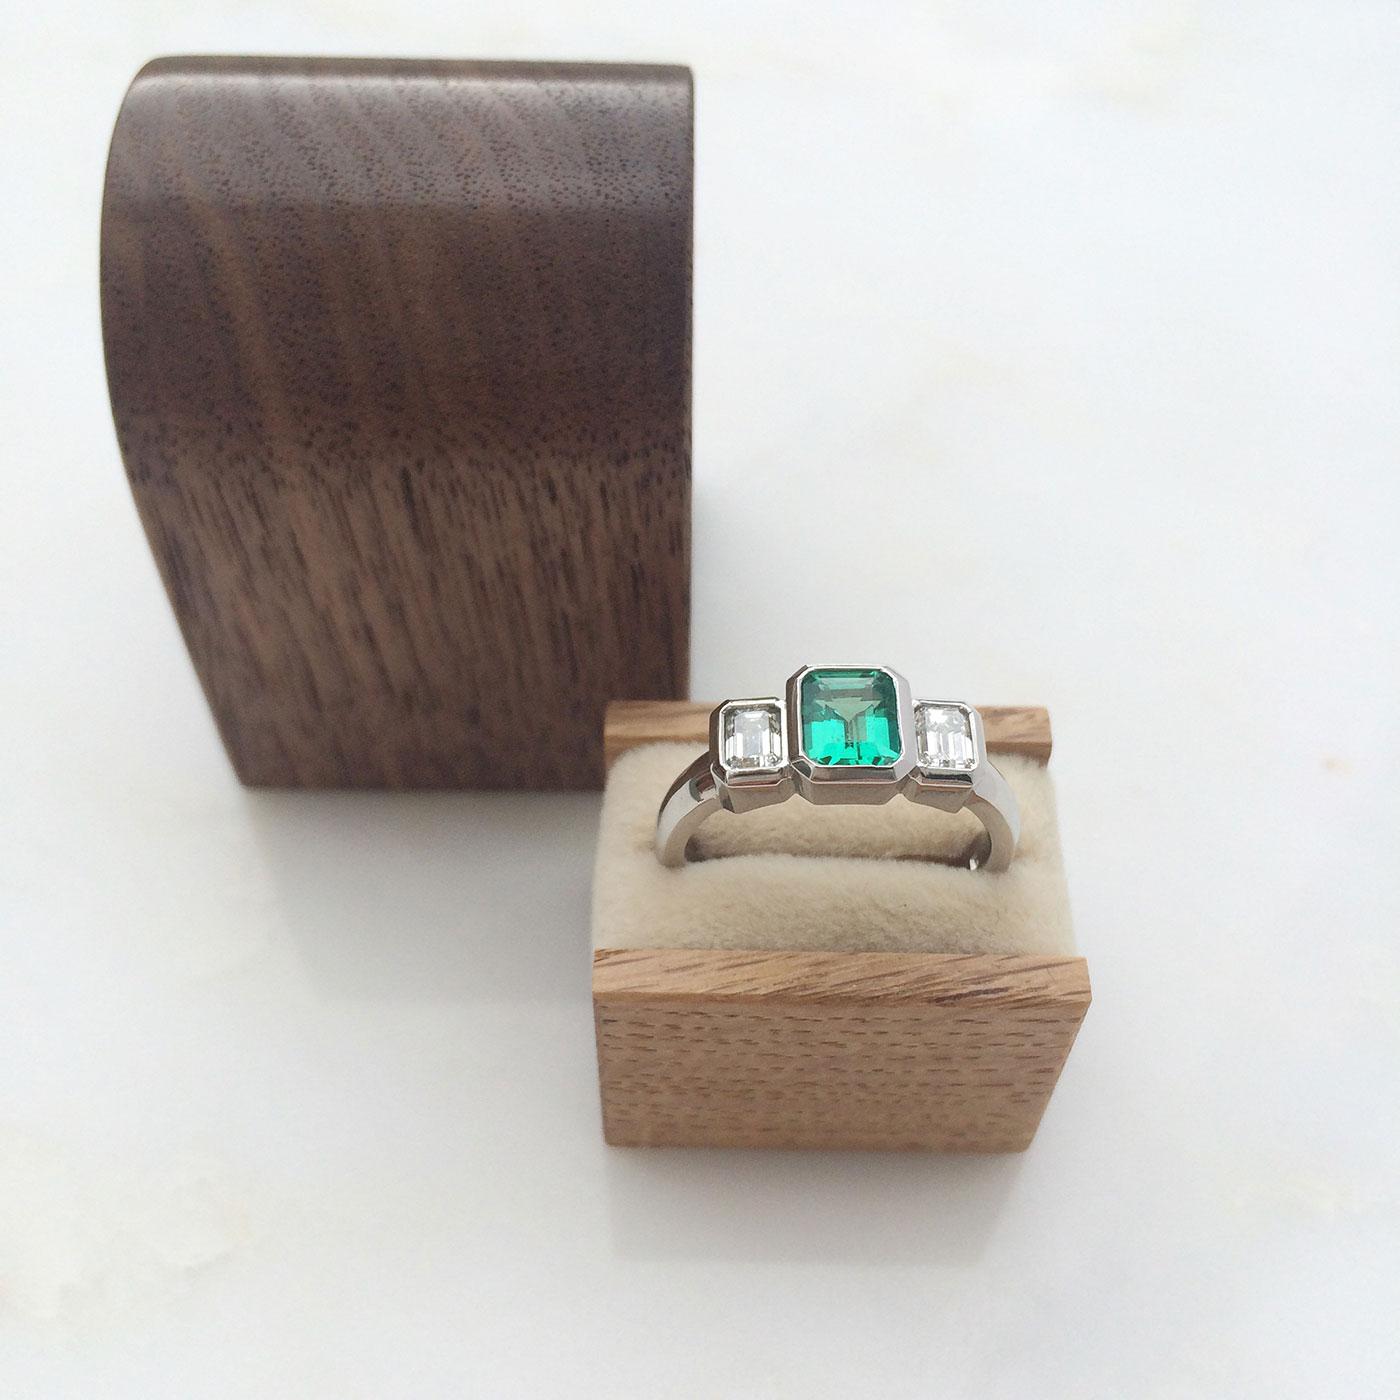 emerald-and-diamond-engagement-ring-bespoke-lottie-jewellery.jpg